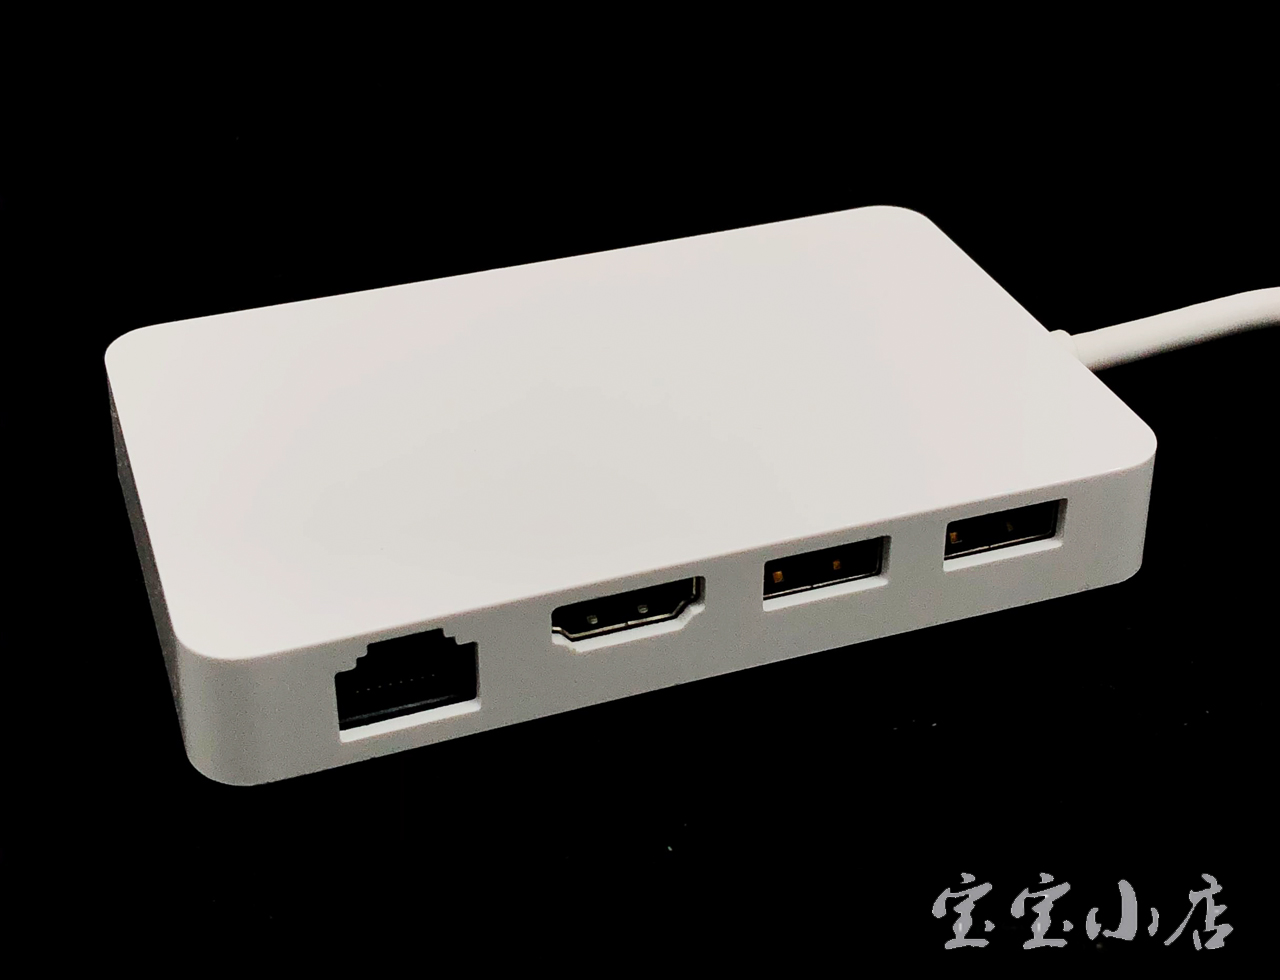 美国影雅InsigniaInsignia 7-Port TypeC Hub Gigabit Ethernet Adapter NS-PUCHUB219 Type C Cable千兆以太网适配器的7端口Type-C集线器 87W供电 5Gbp/s typec to HDMI